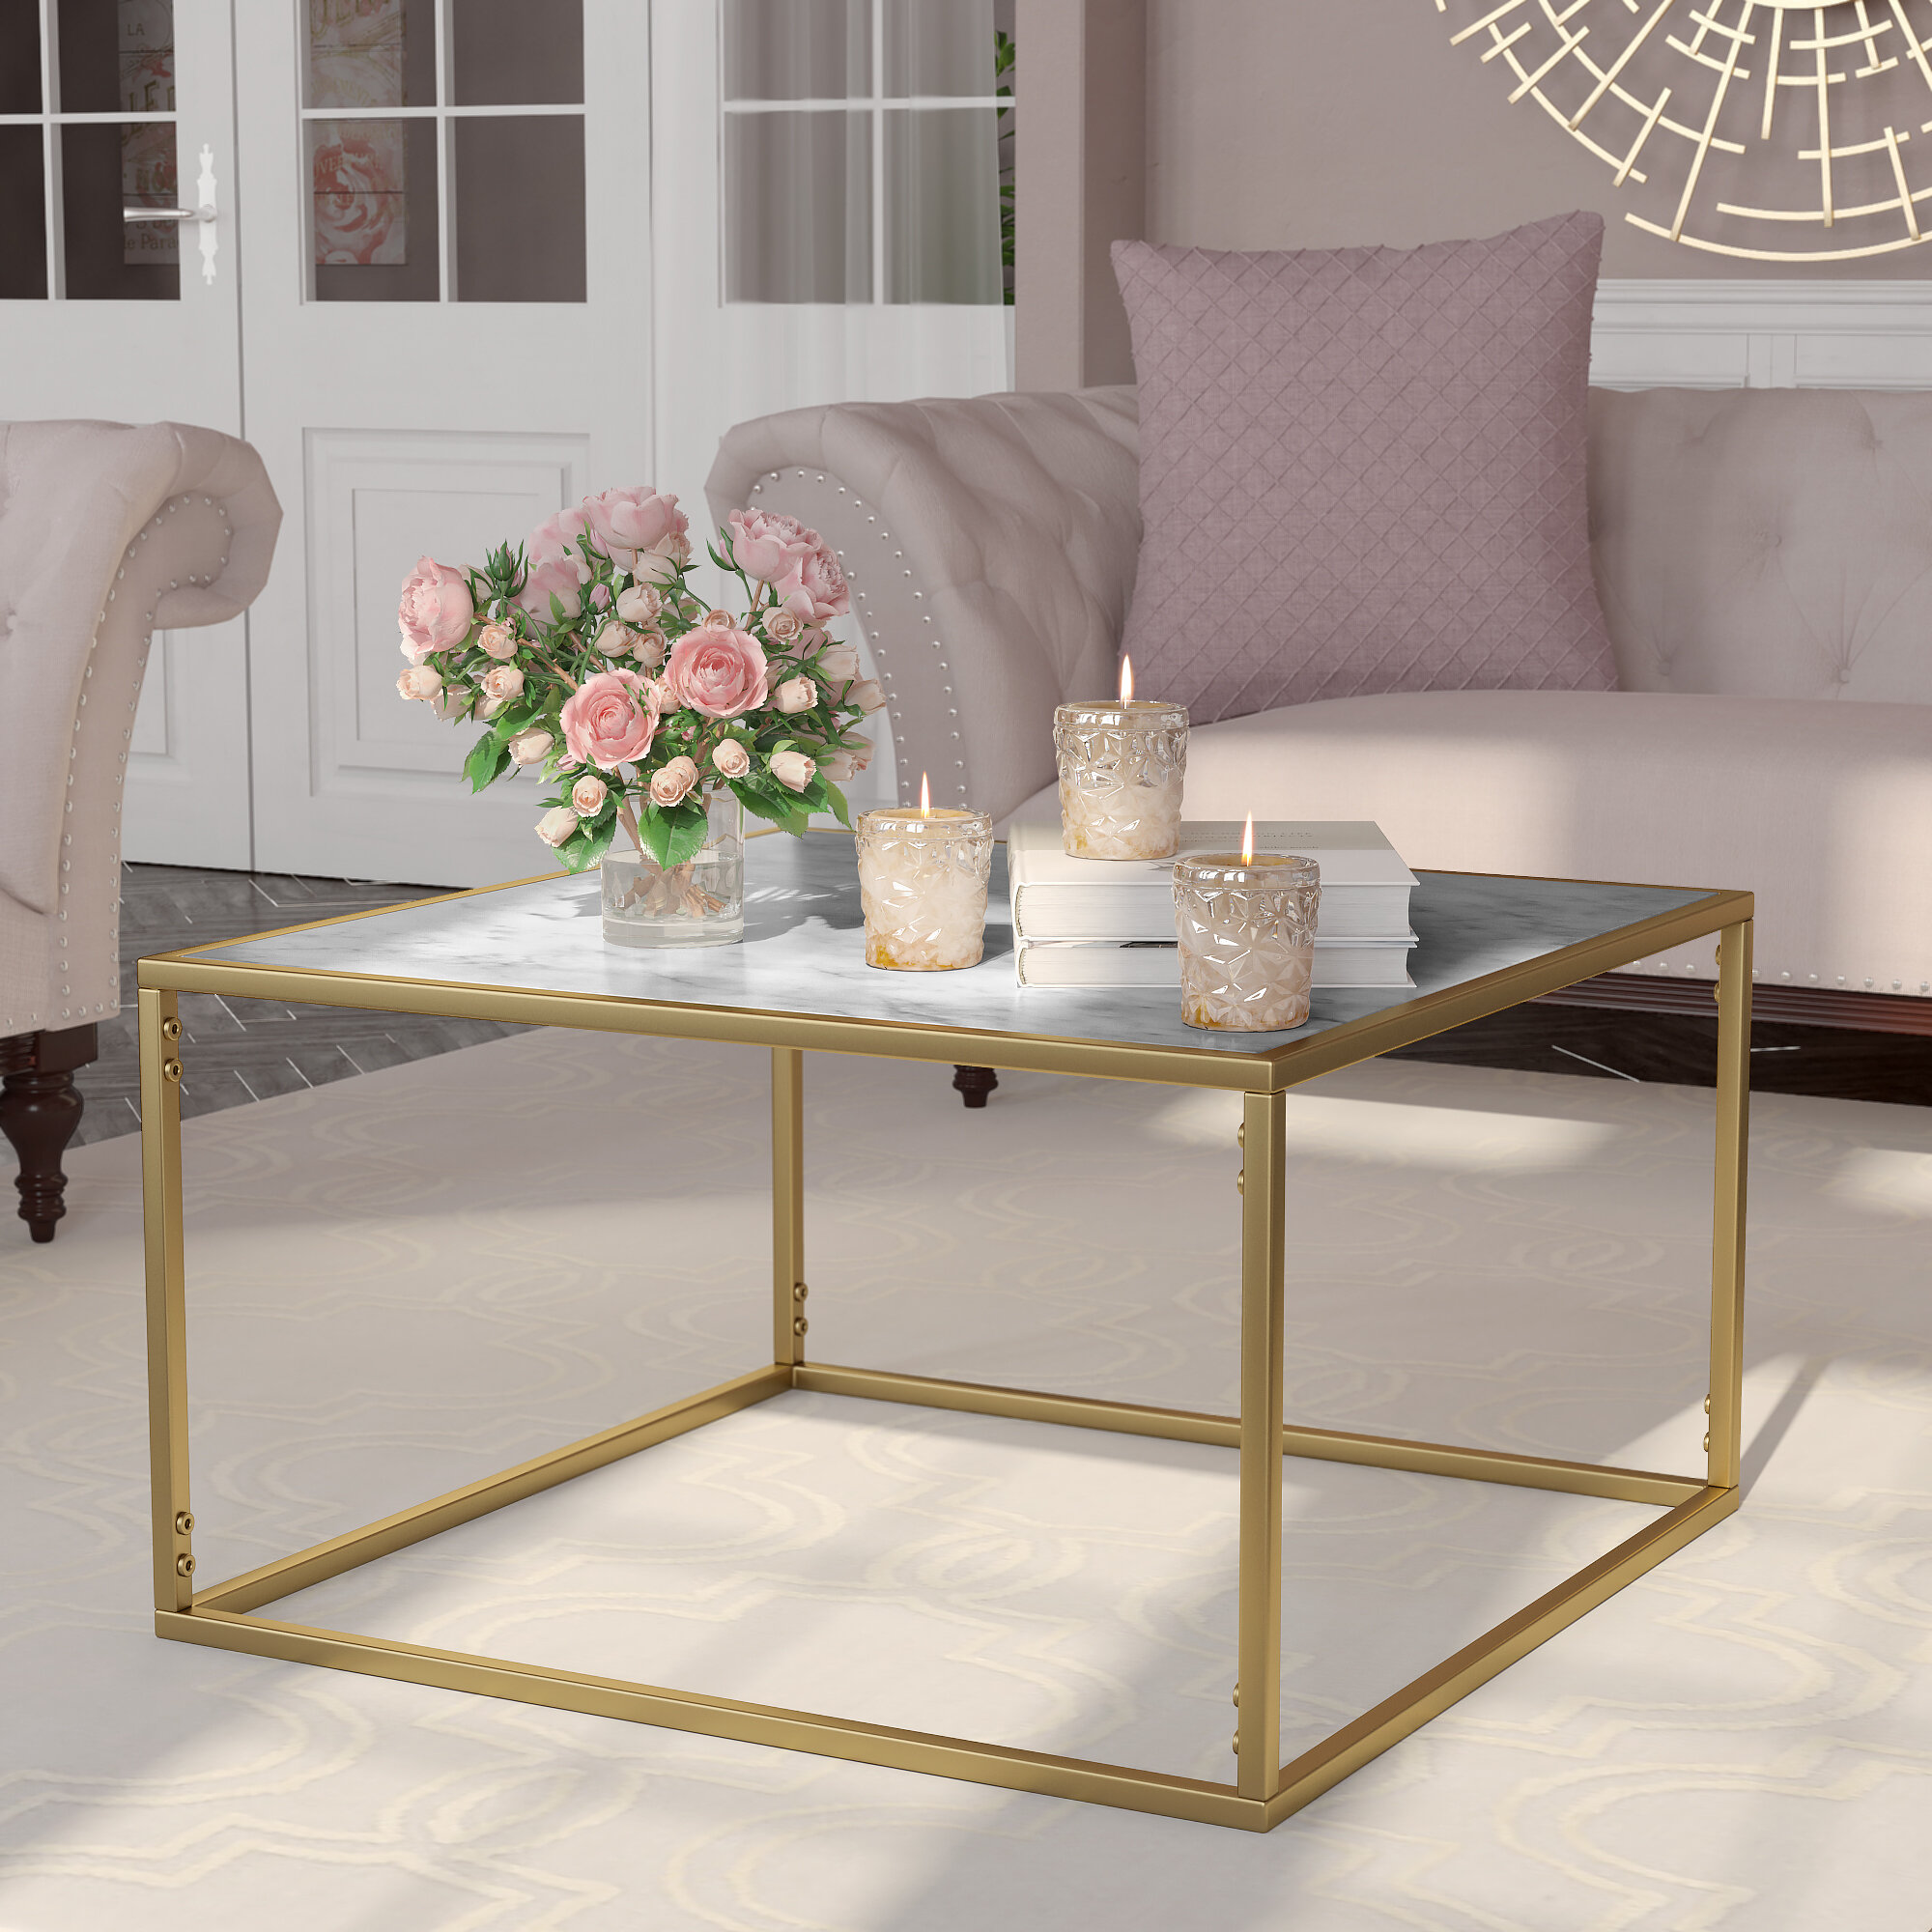 Attractive Willa Arlo Interiors Theydon Coffee Table U0026 Reviews   Wayfair